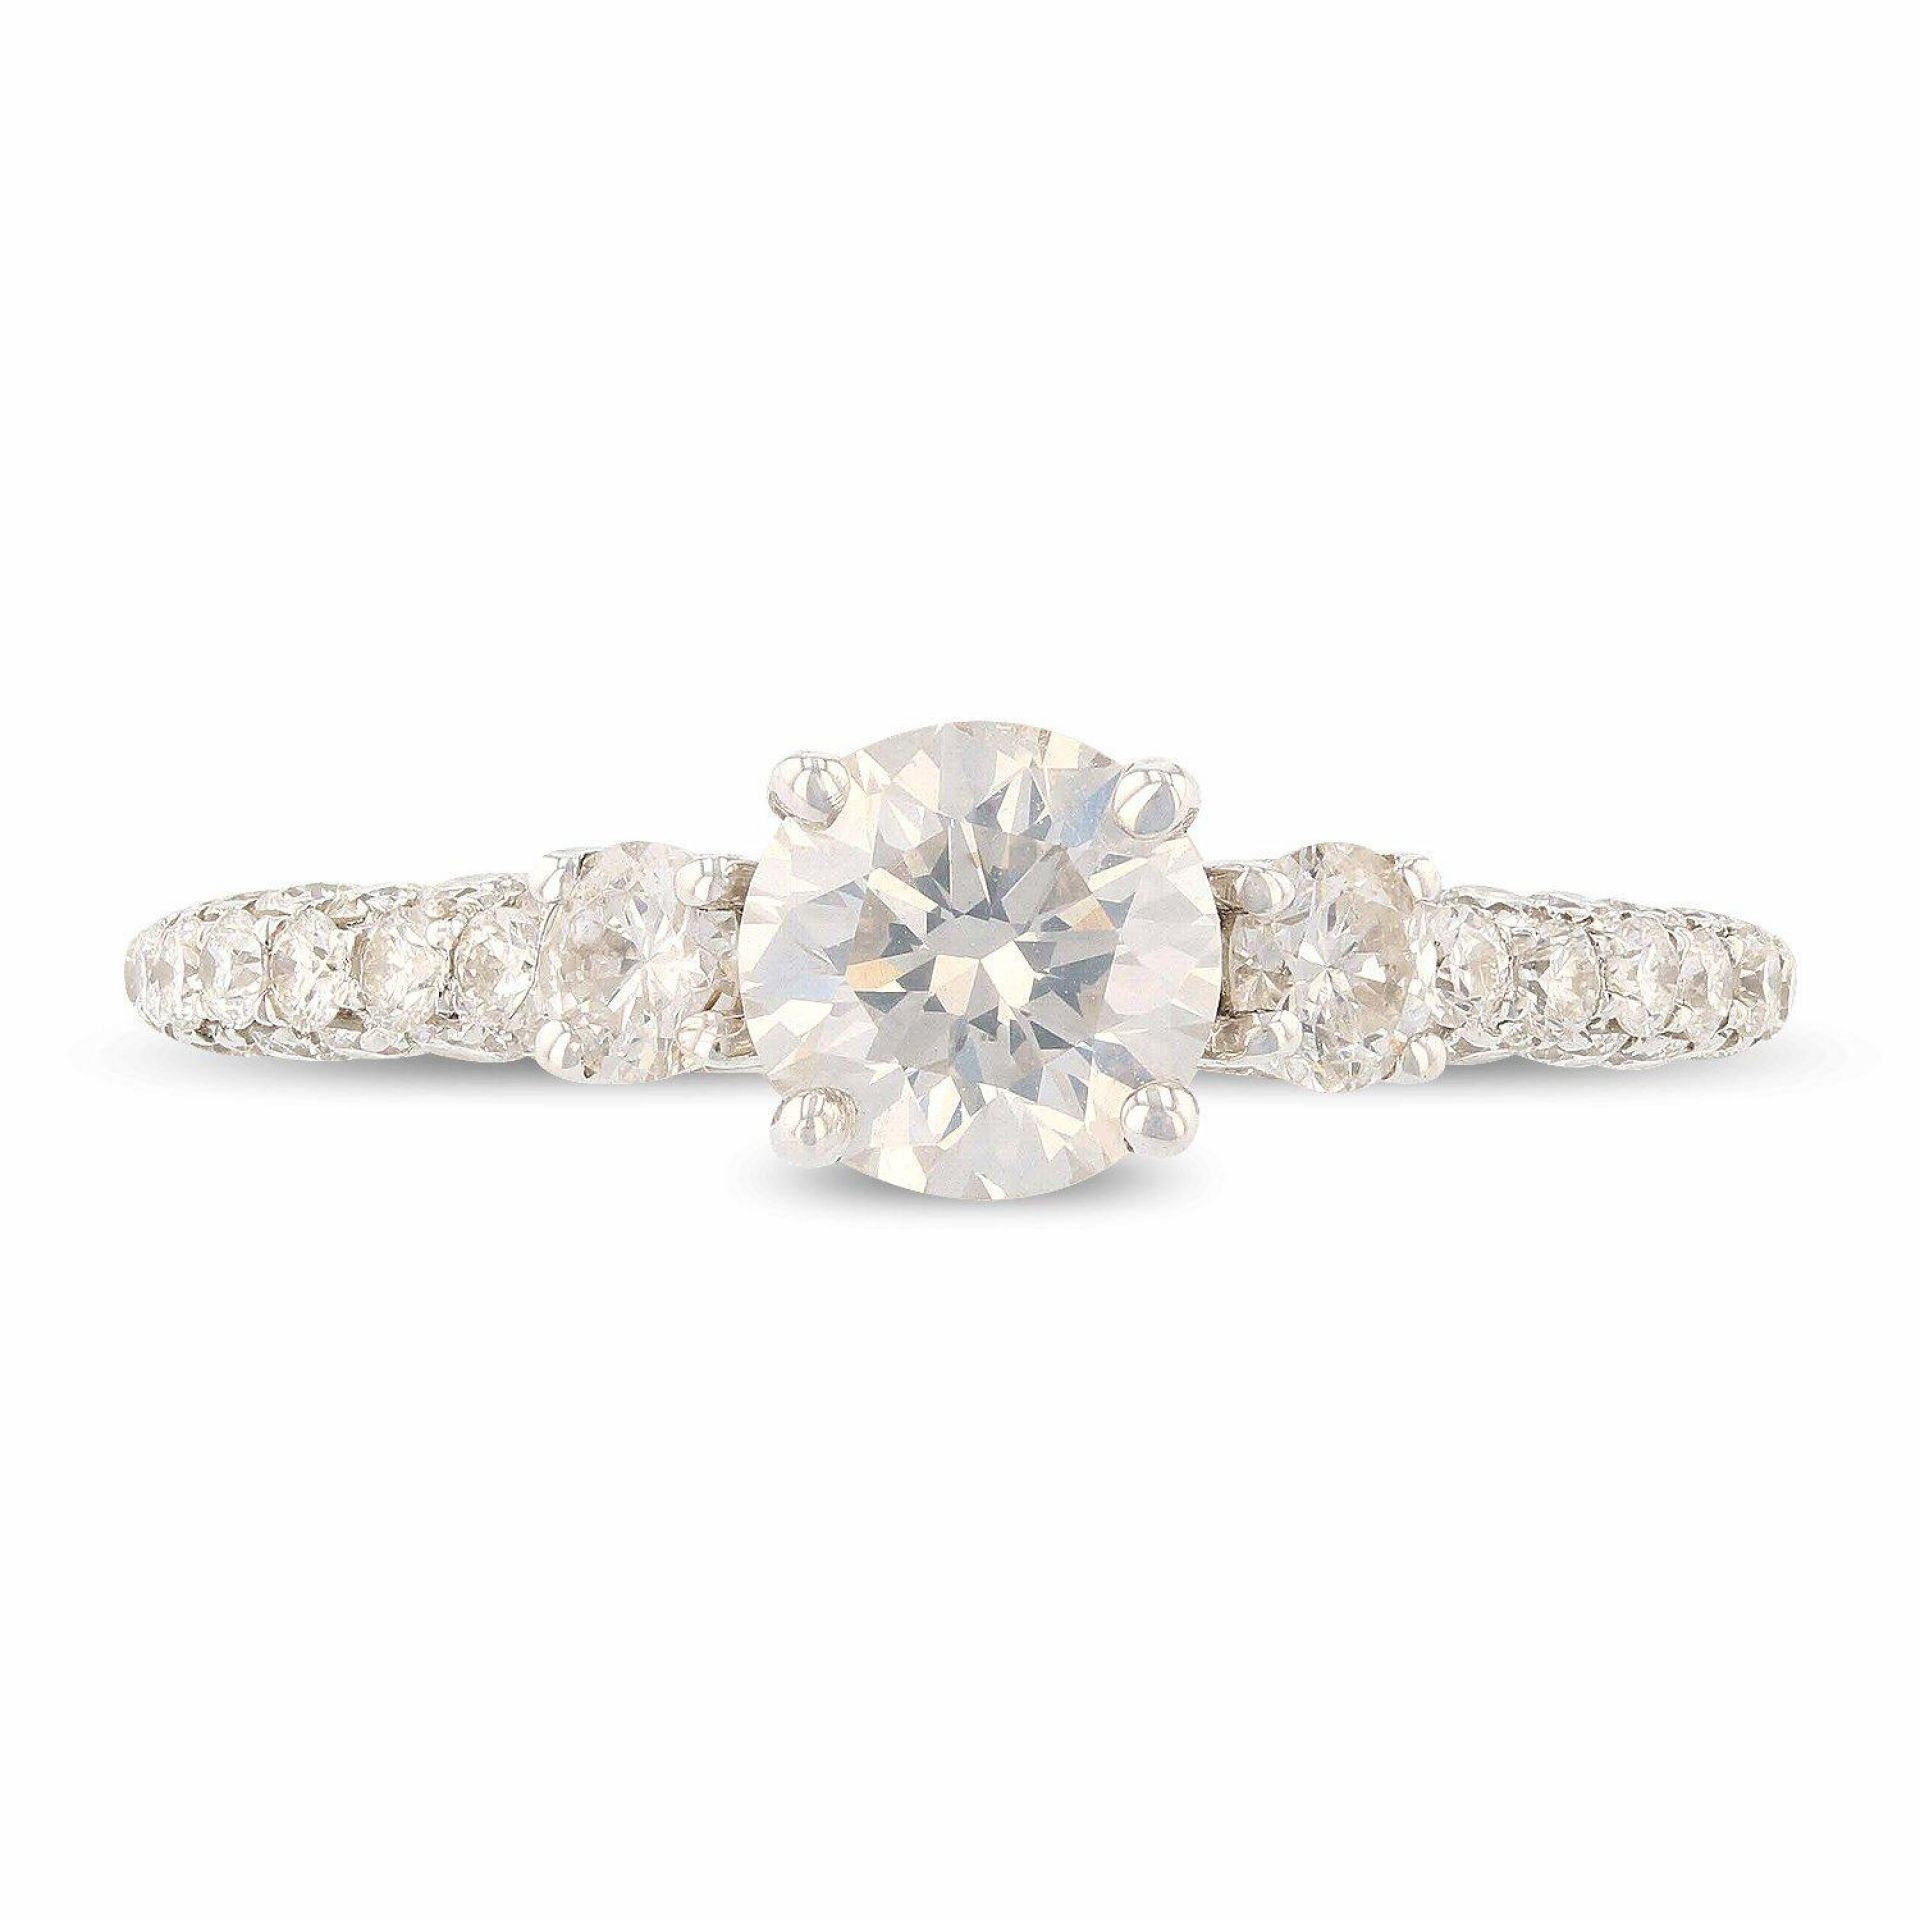 0.75ct SI3 CLARITY CENTER Diamond 18KT White Gold Ring (1.63ctw Diamonds) EGL CE